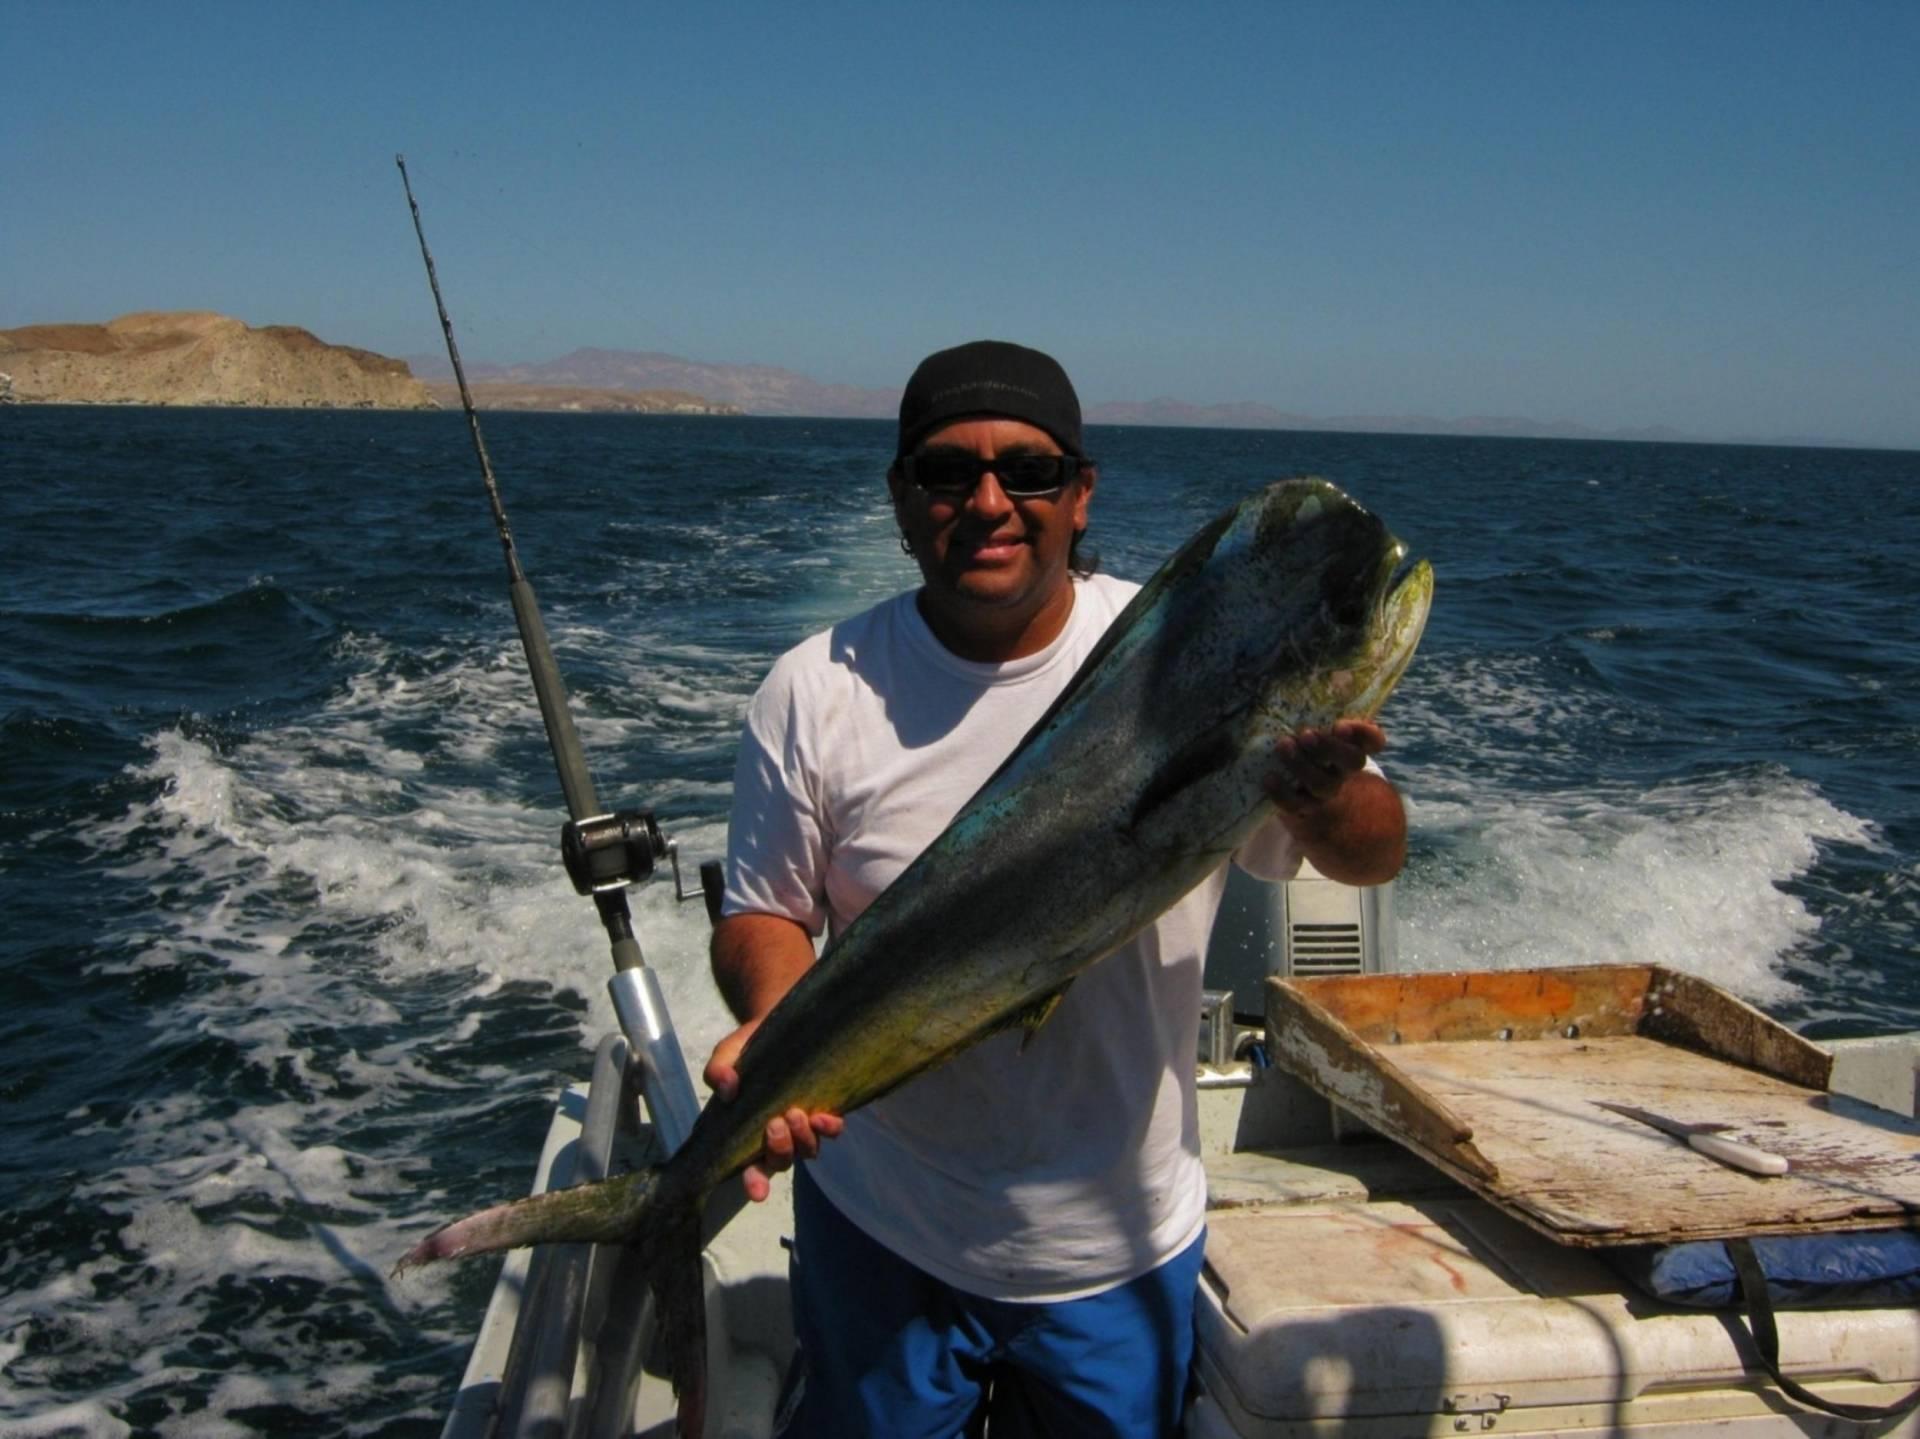 Bahia de los angeles 9 24 9 25 bloodydecks for Fishing los angeles